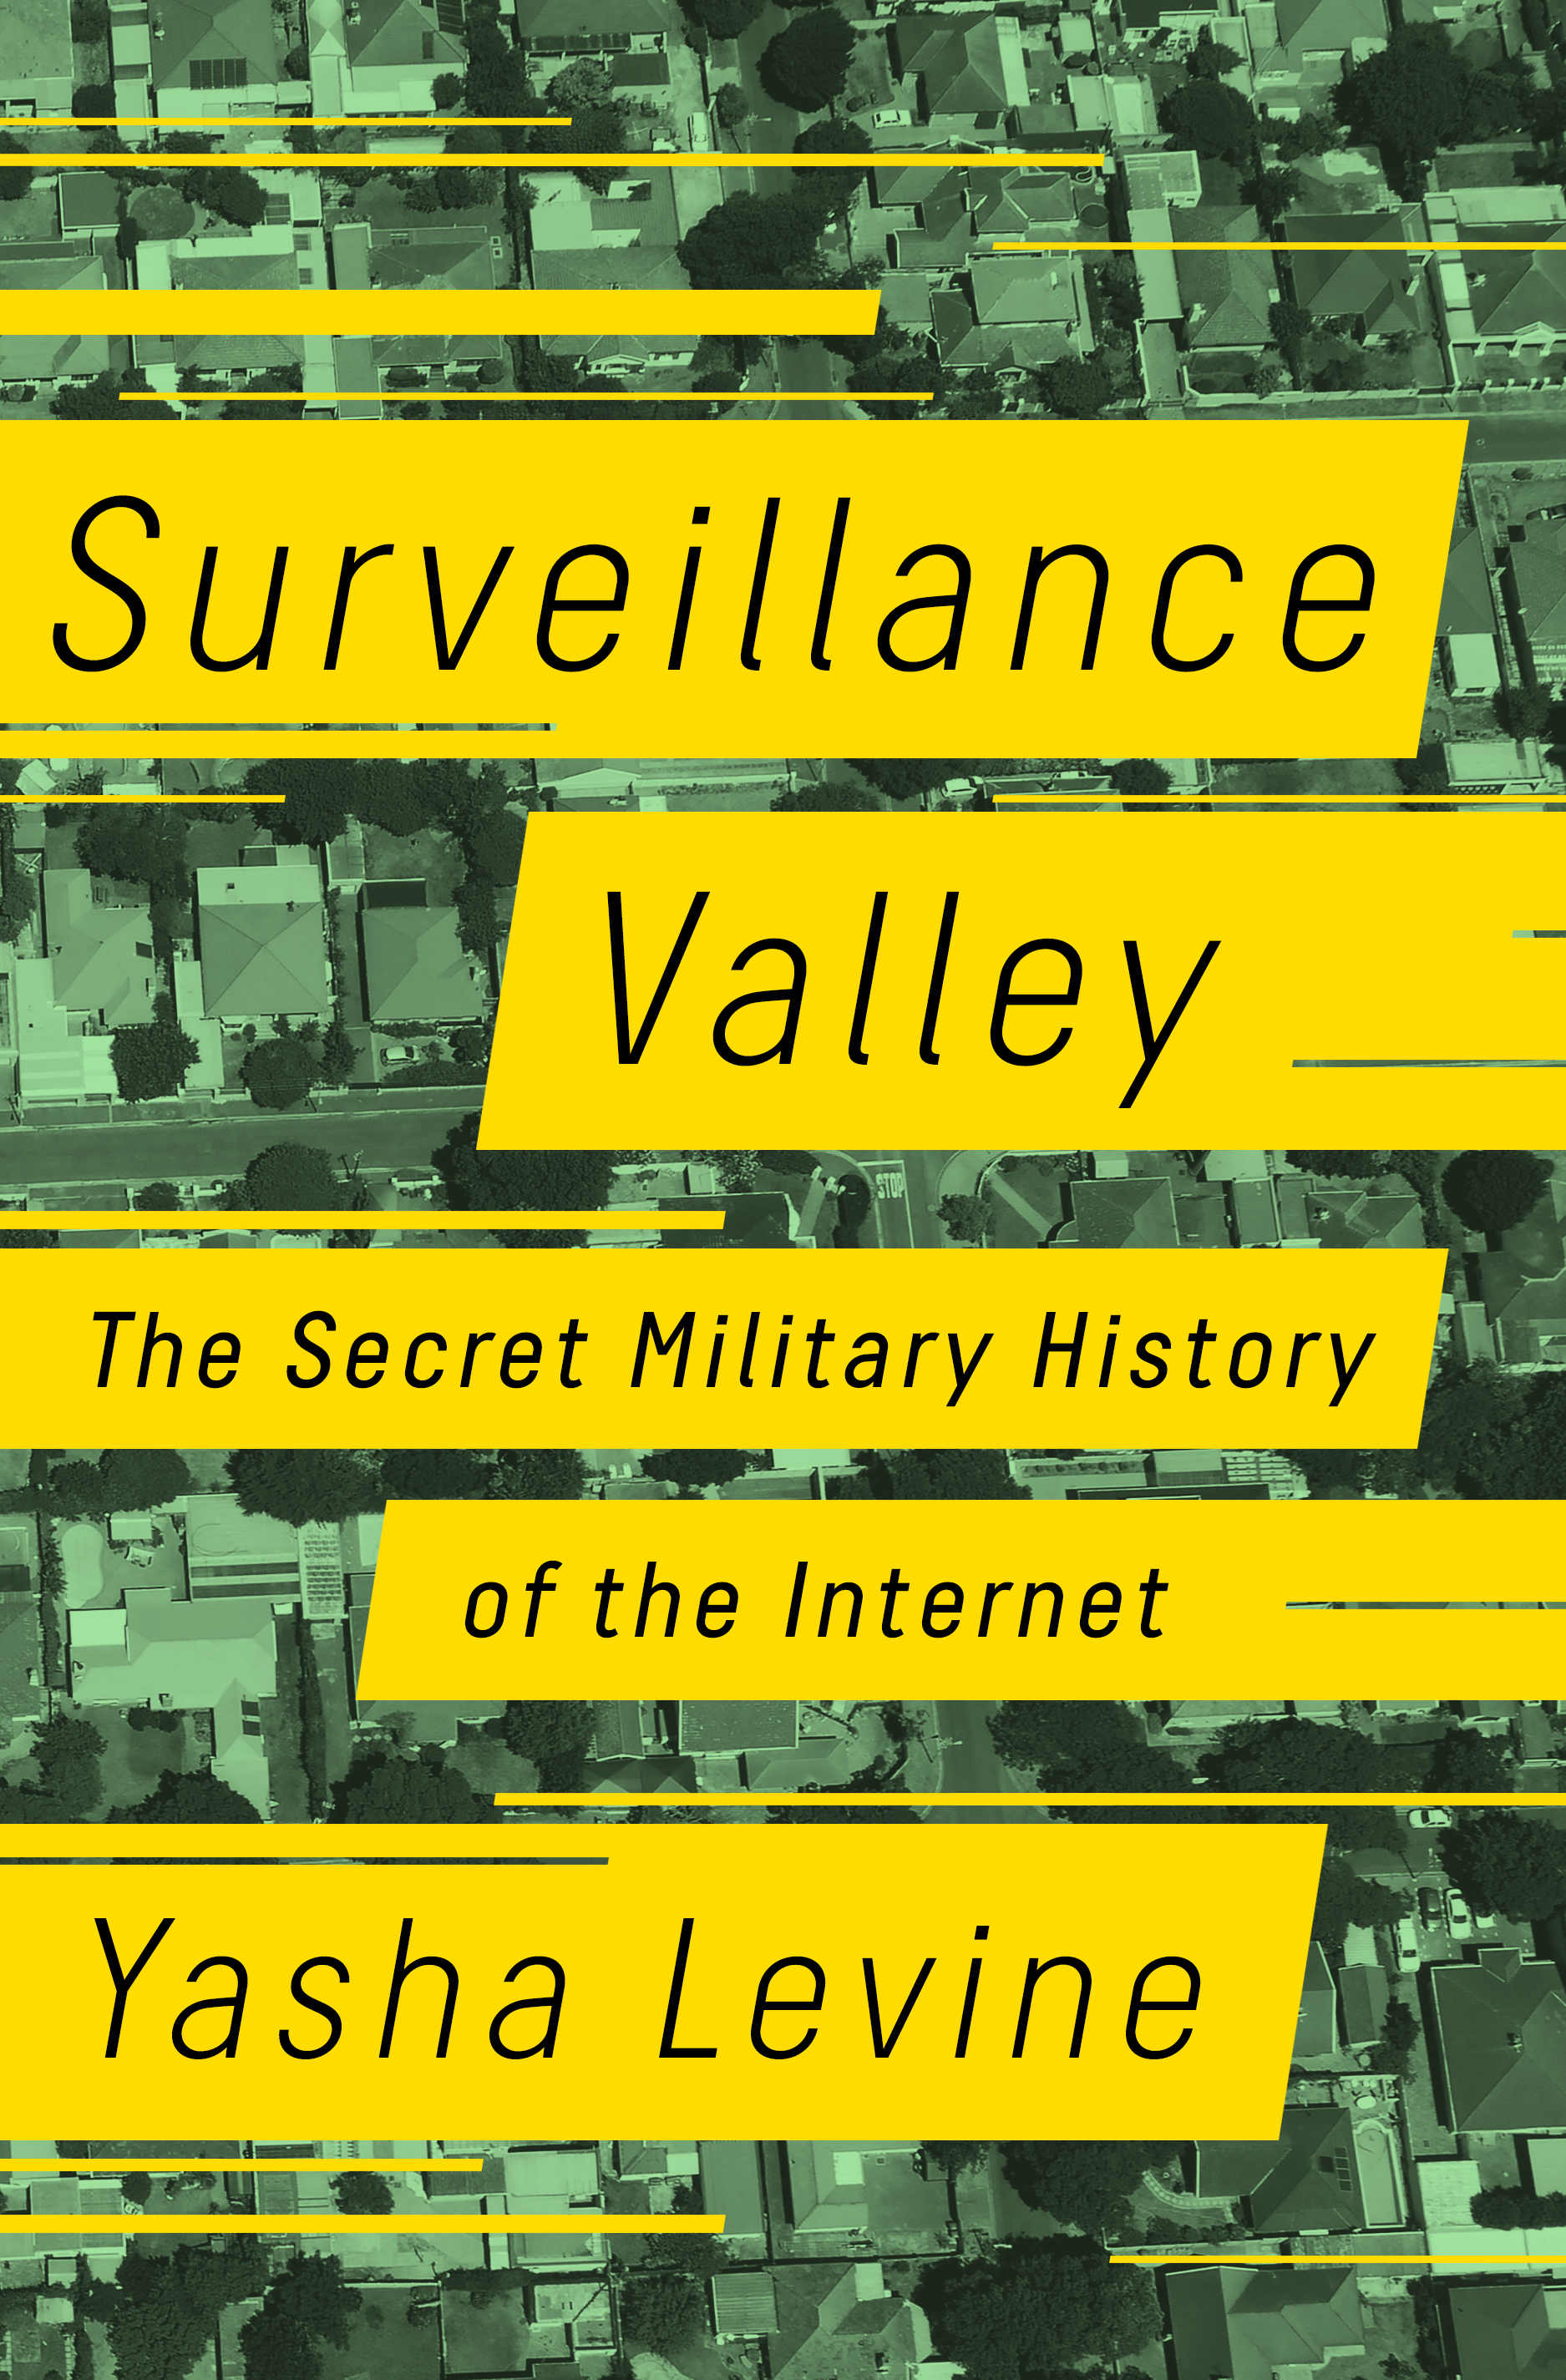 Book Launch: Surveillance Valley by Yasha Levine